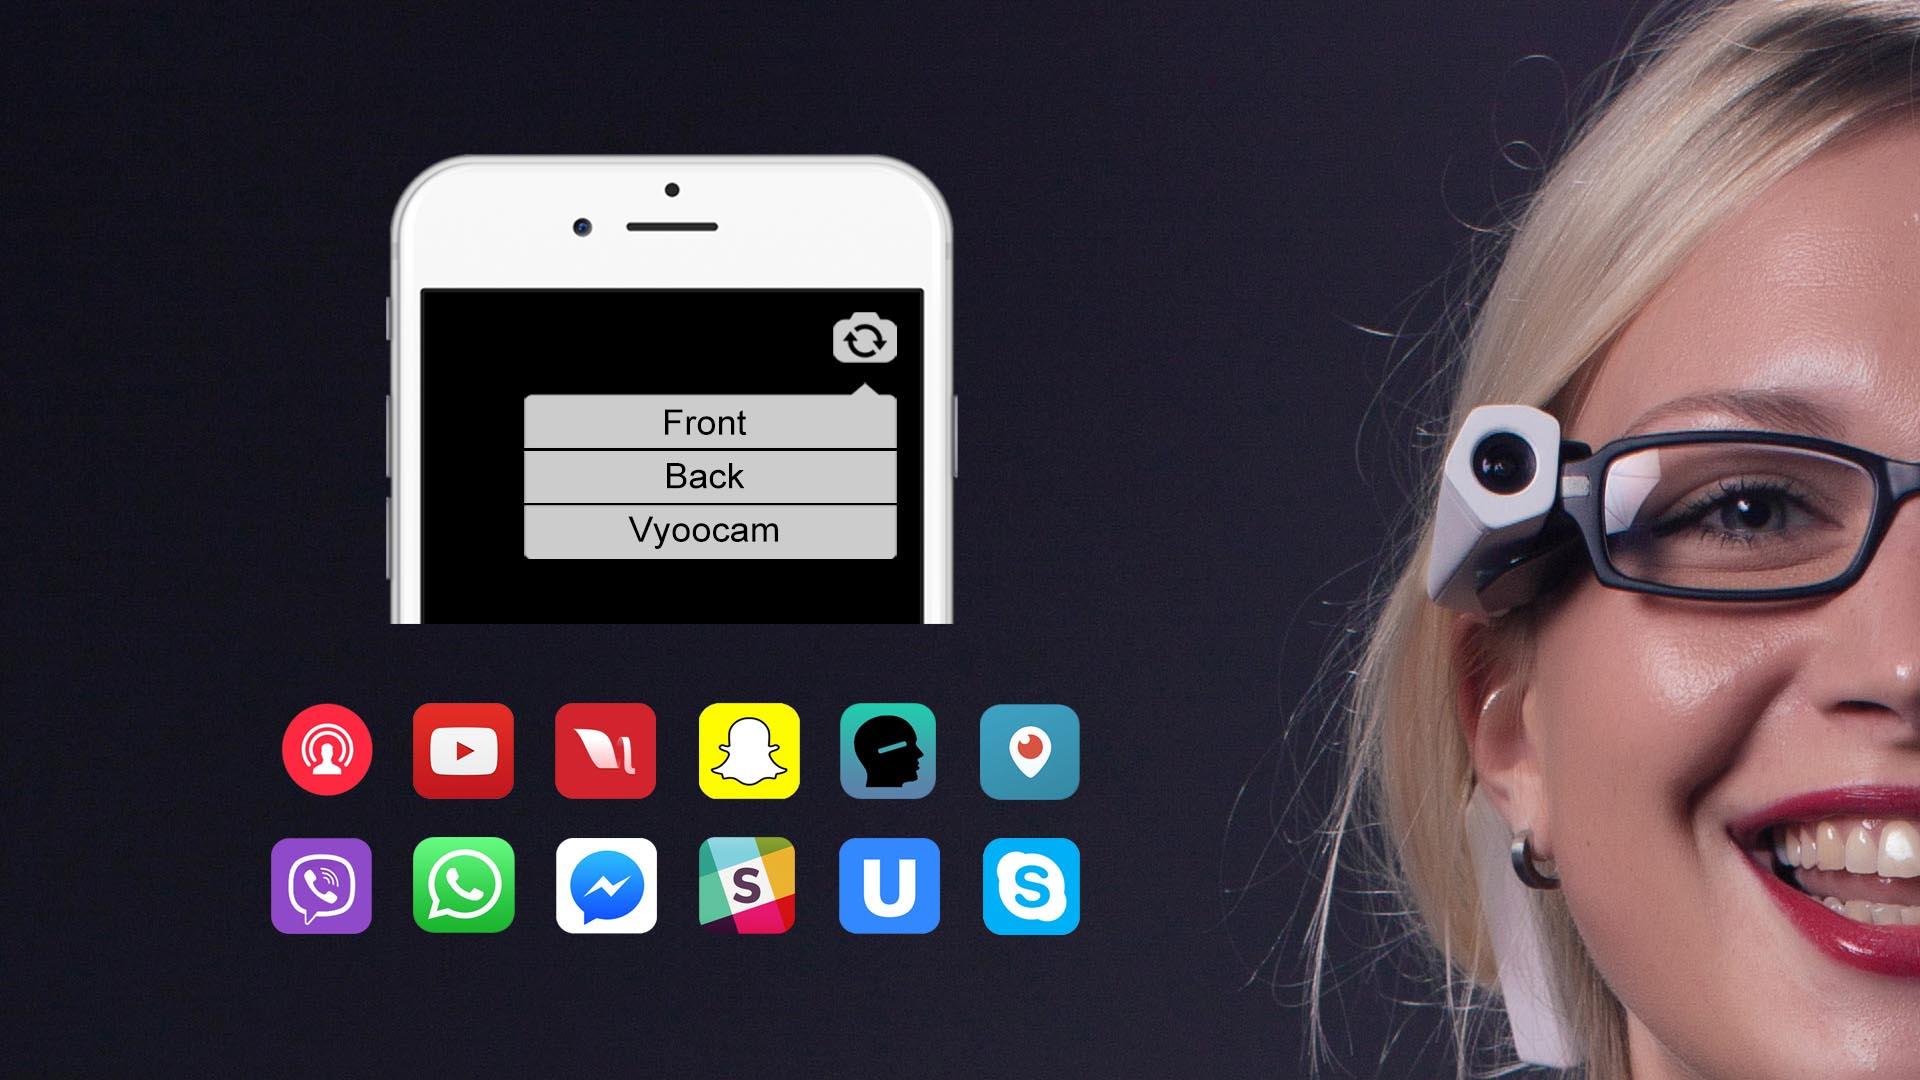 vyoocam-third-camera-option